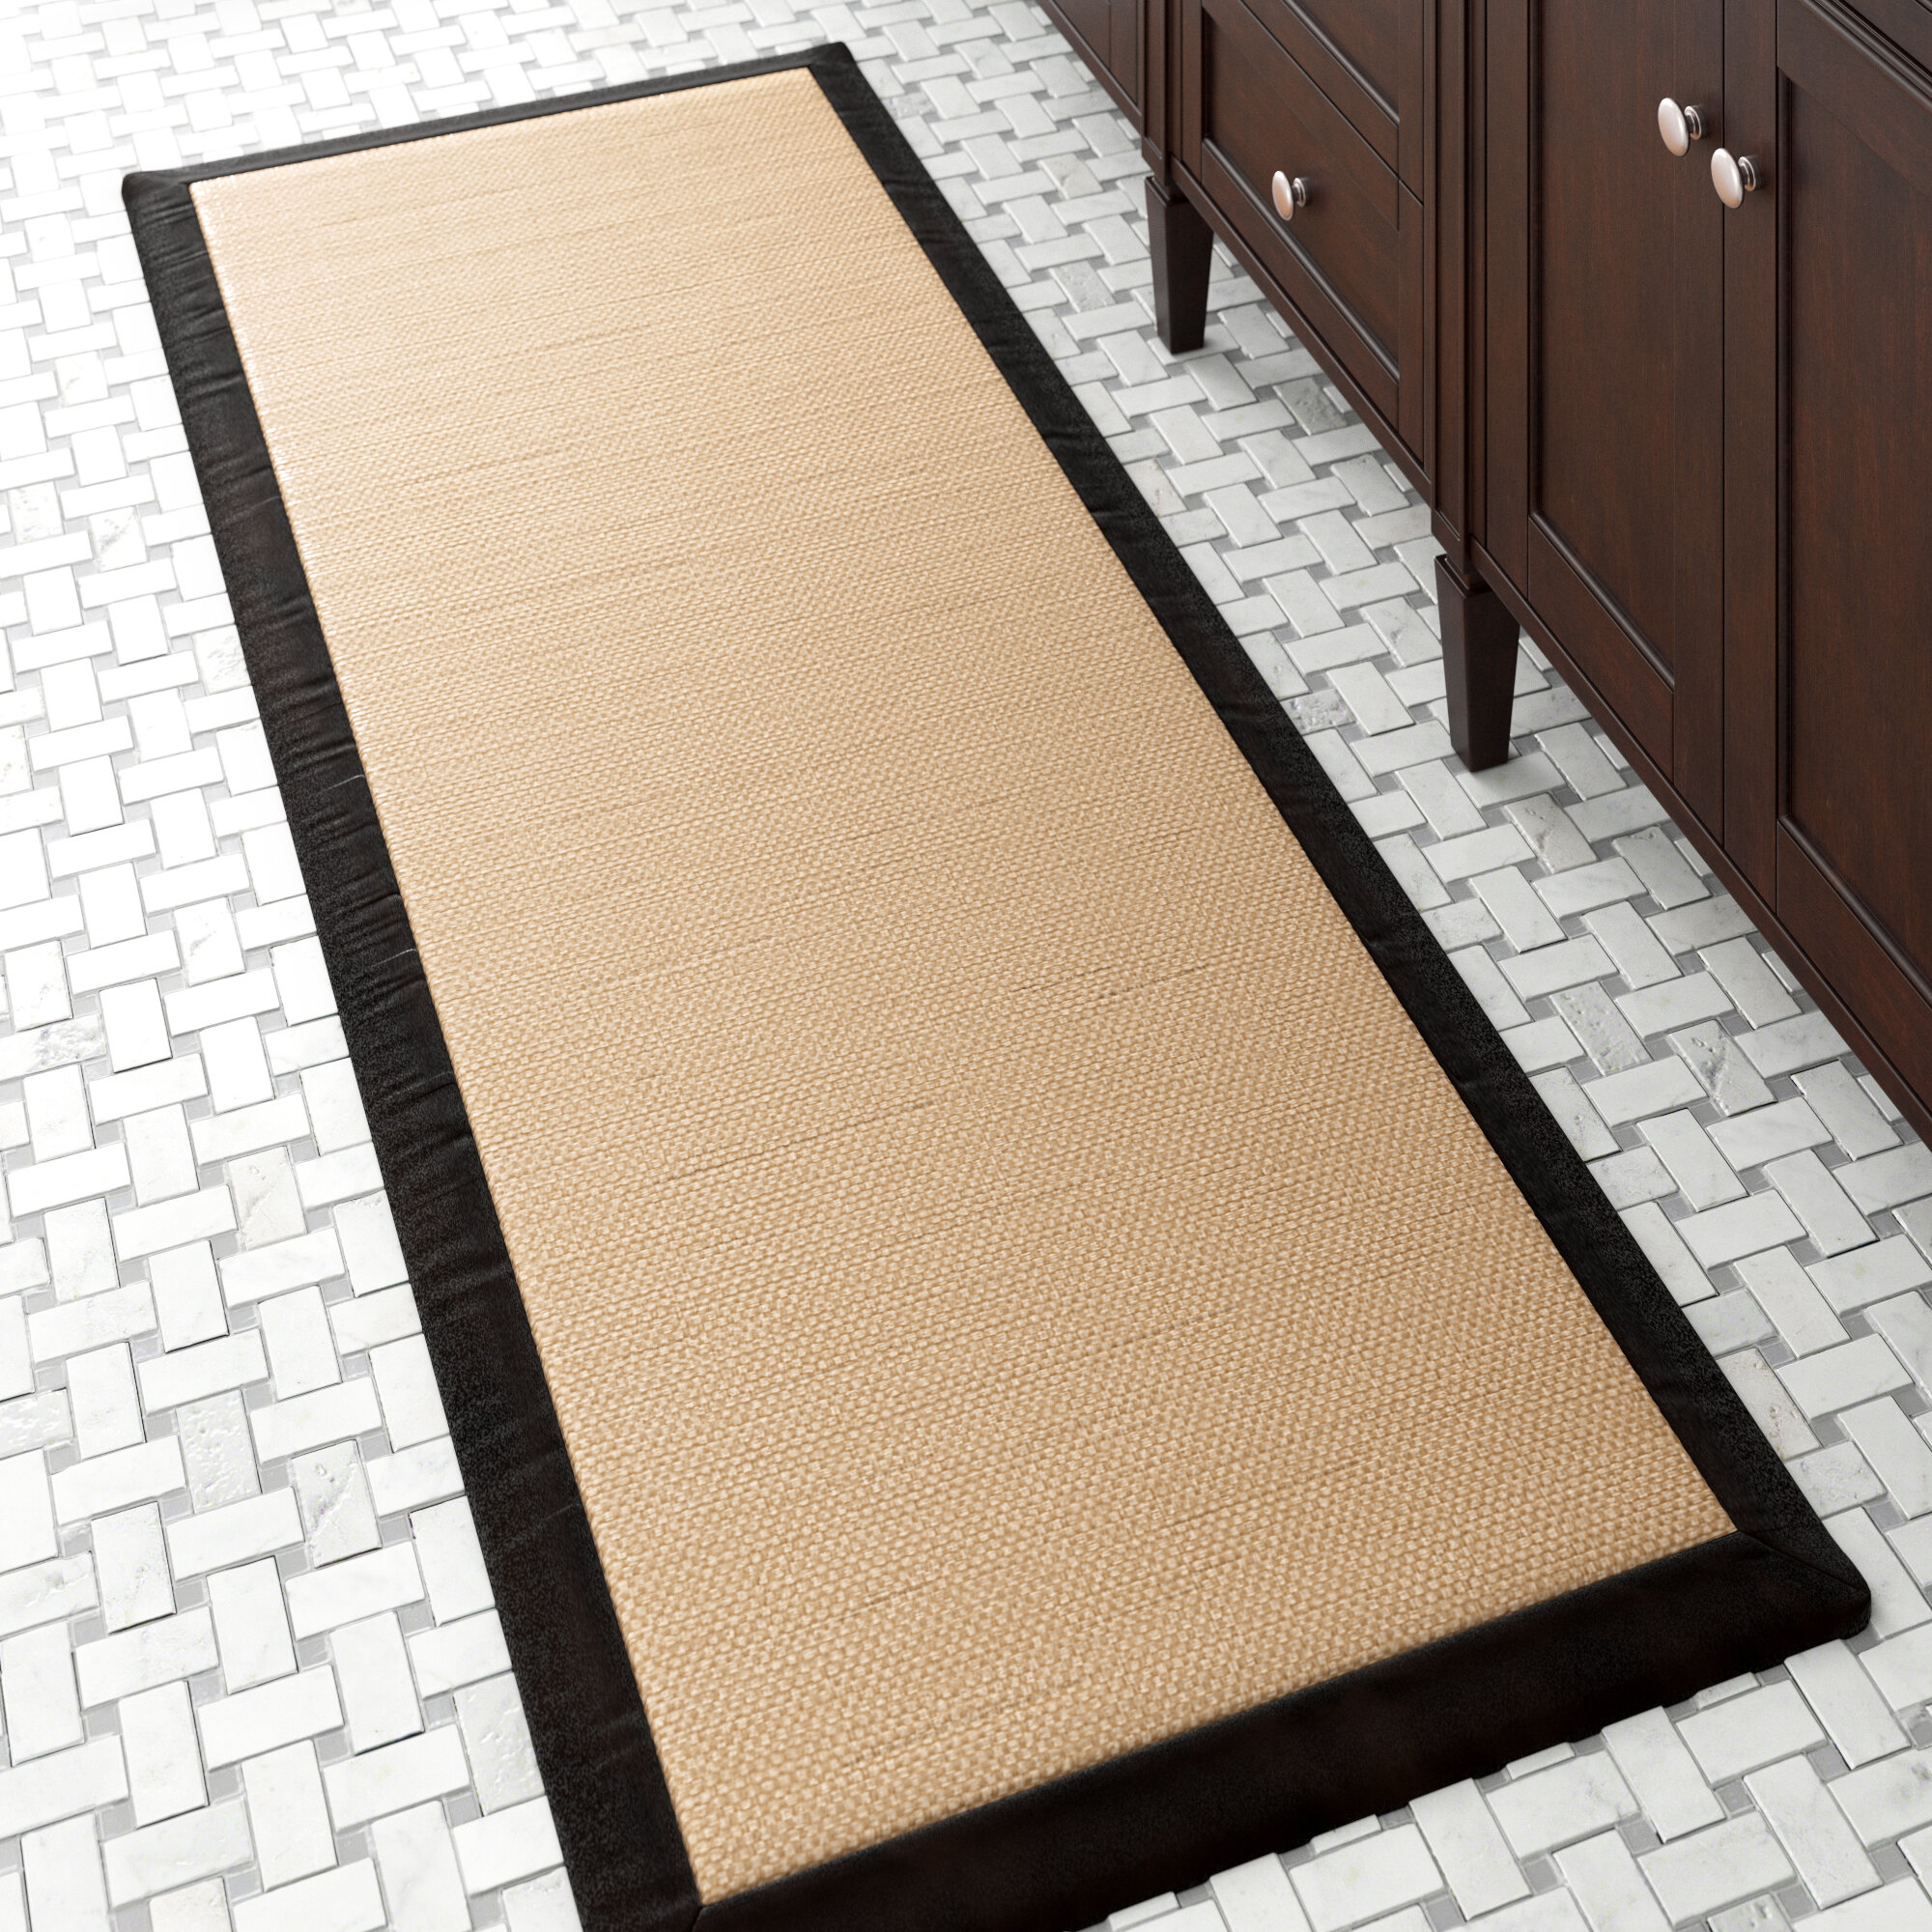 Darby Home Co Thorne Rectangular Memory Foam Non Slip Solid Bath Rug Reviews Wayfair